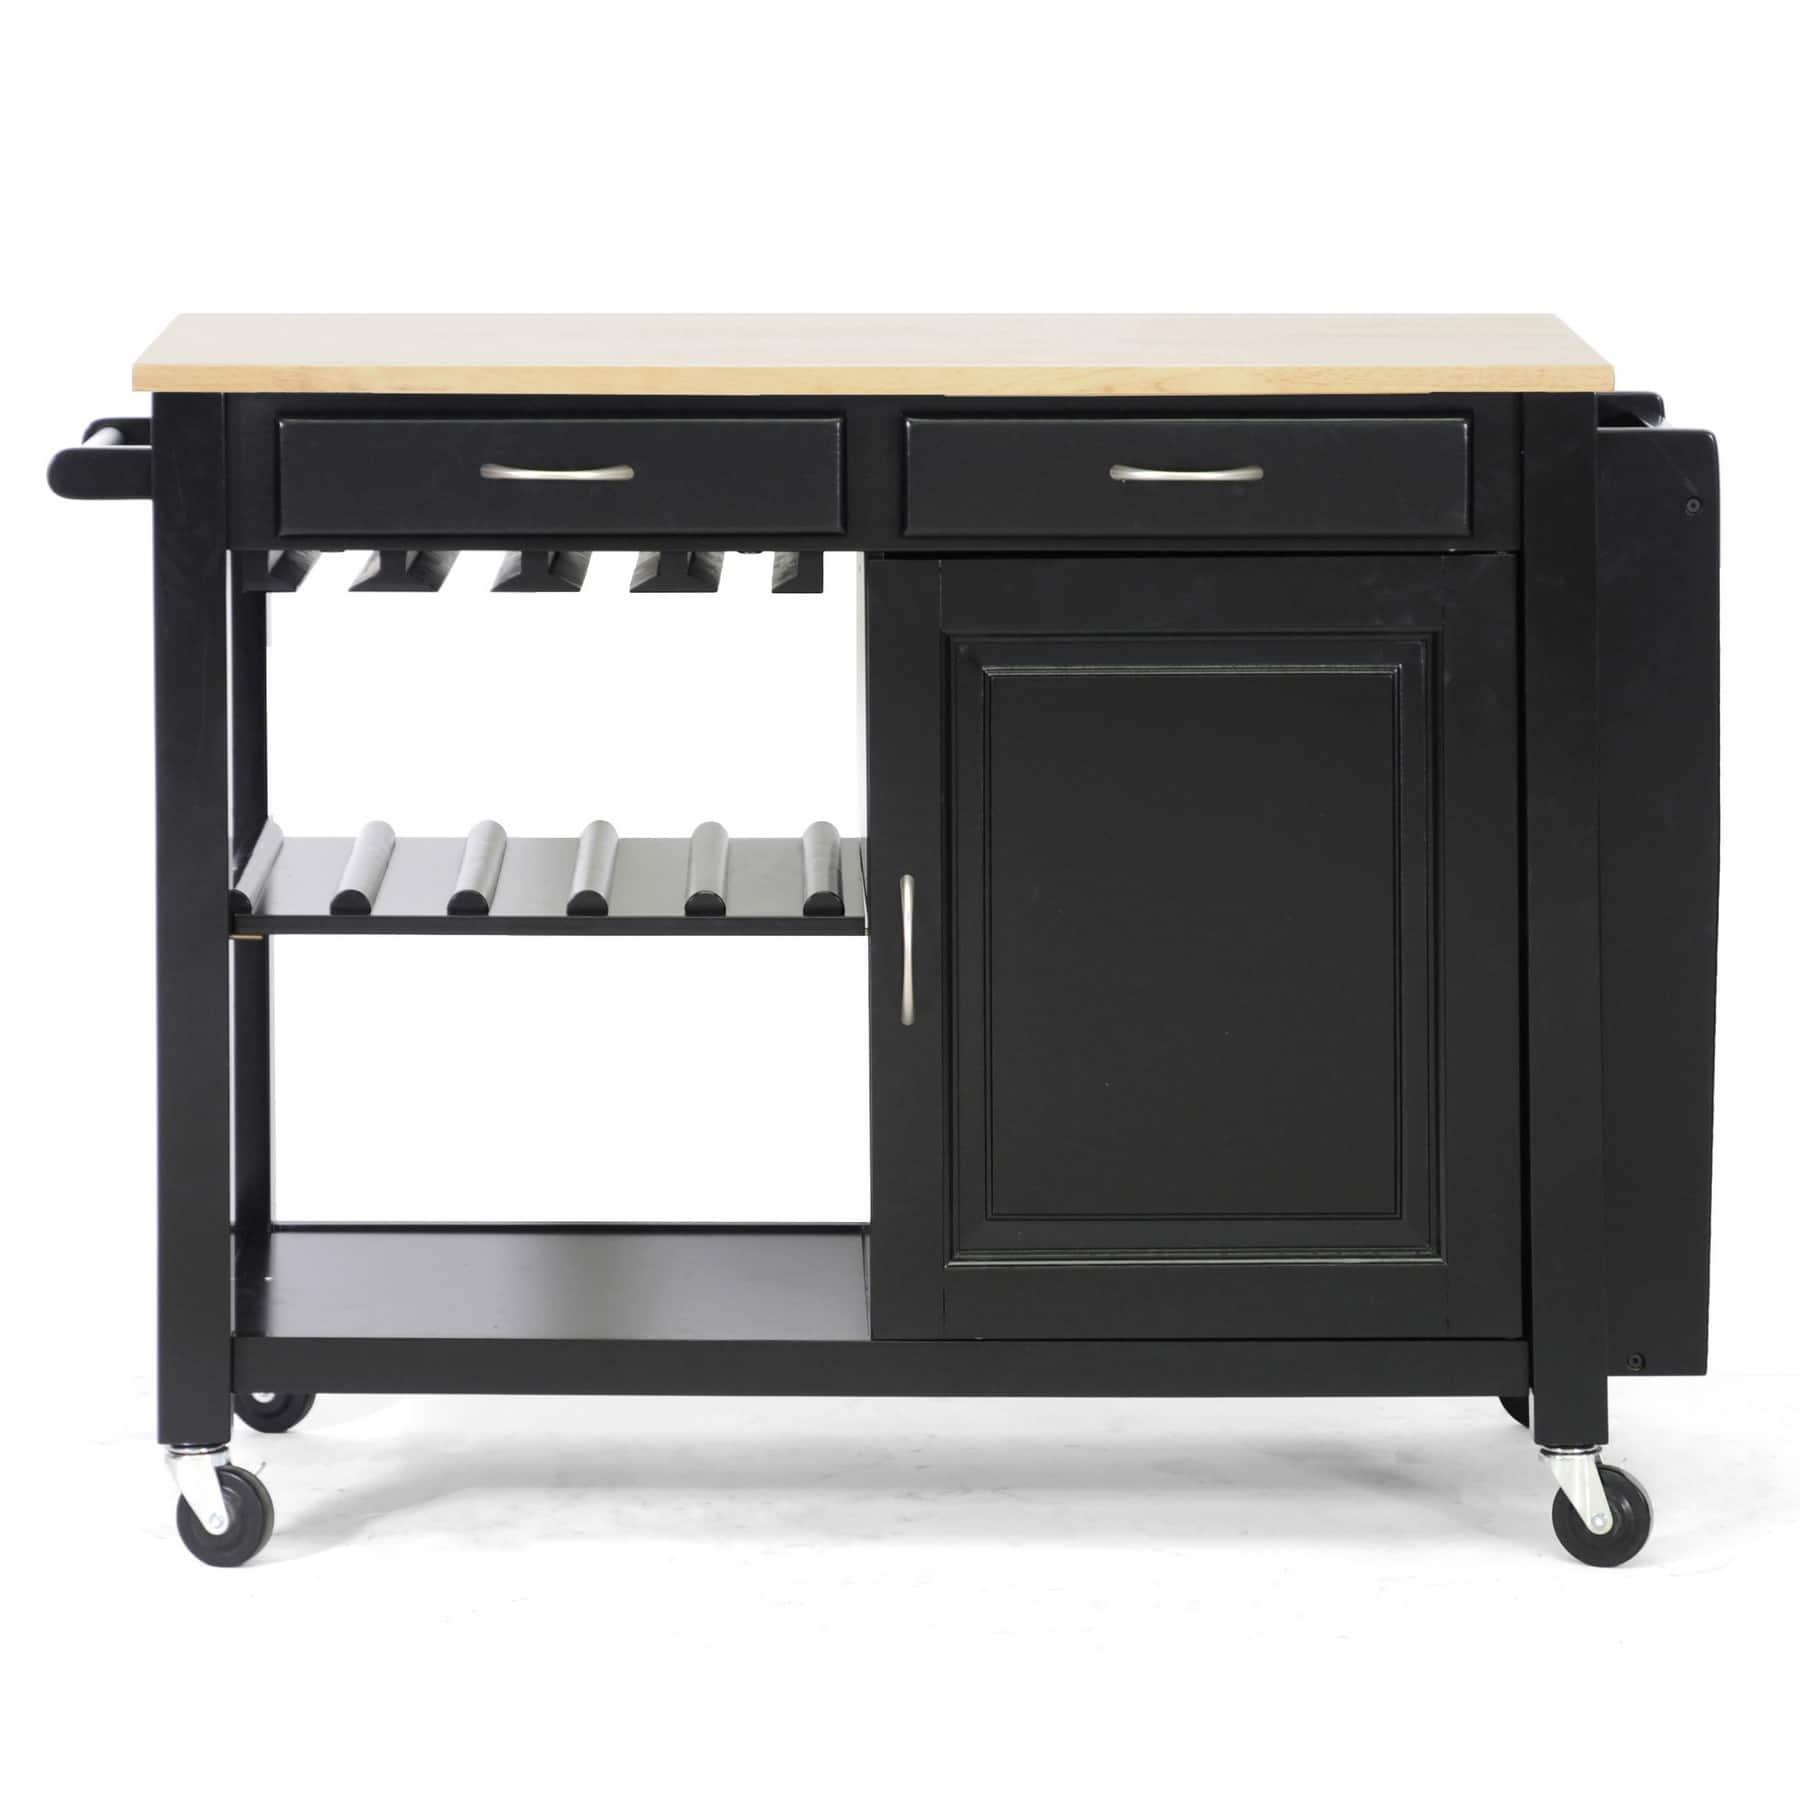 Buy Kitchen Furniture Online: Buy Kitchen Islands Online At Overstock